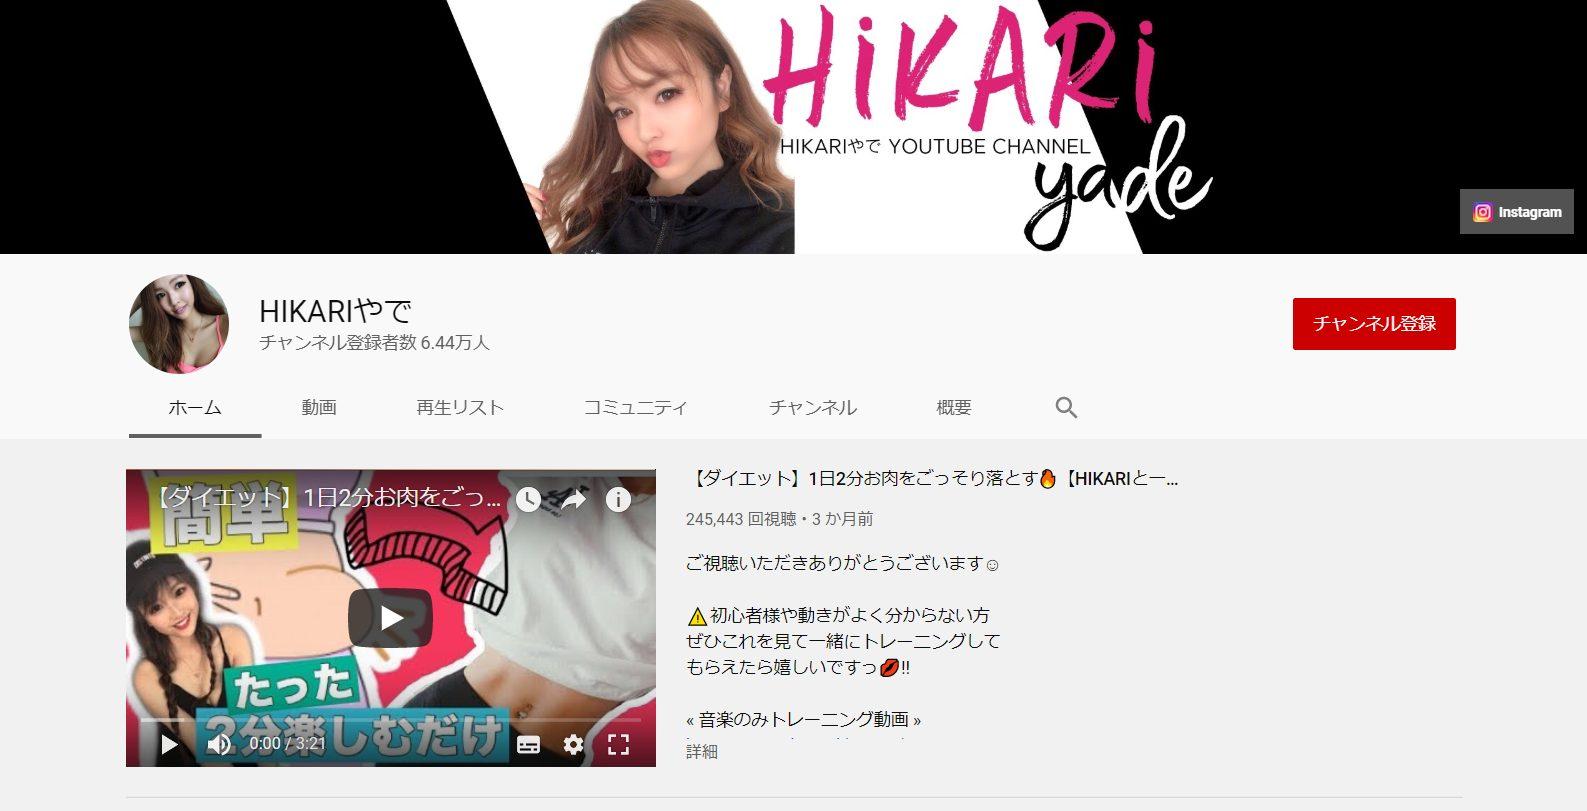 youtube-diet-influencer-hikariyade